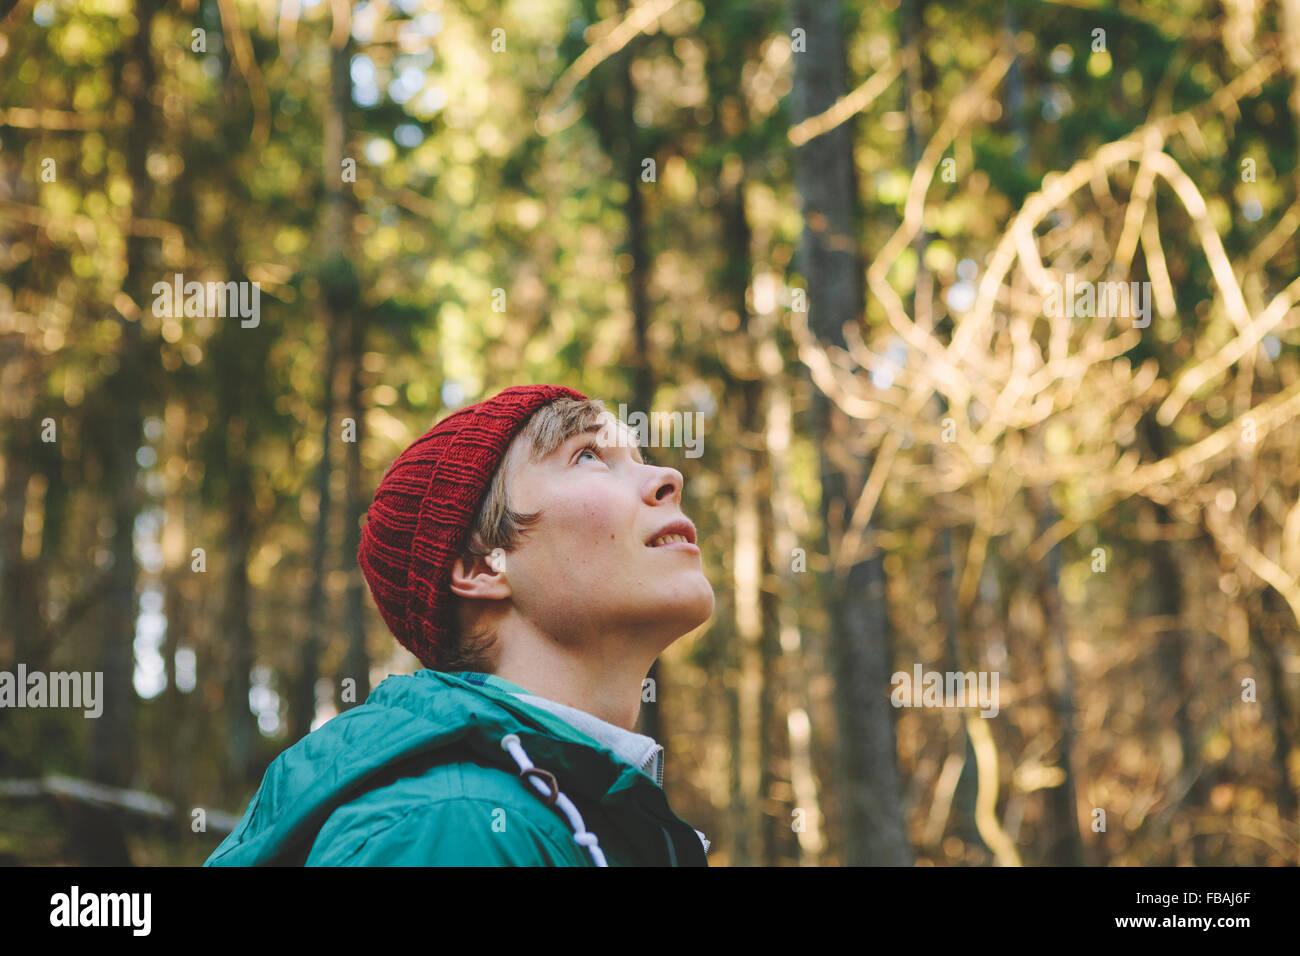 Finnland, ESO, Kvarntrask, Porträt des jungen Mann im Wald, Blick nach oben Stockbild